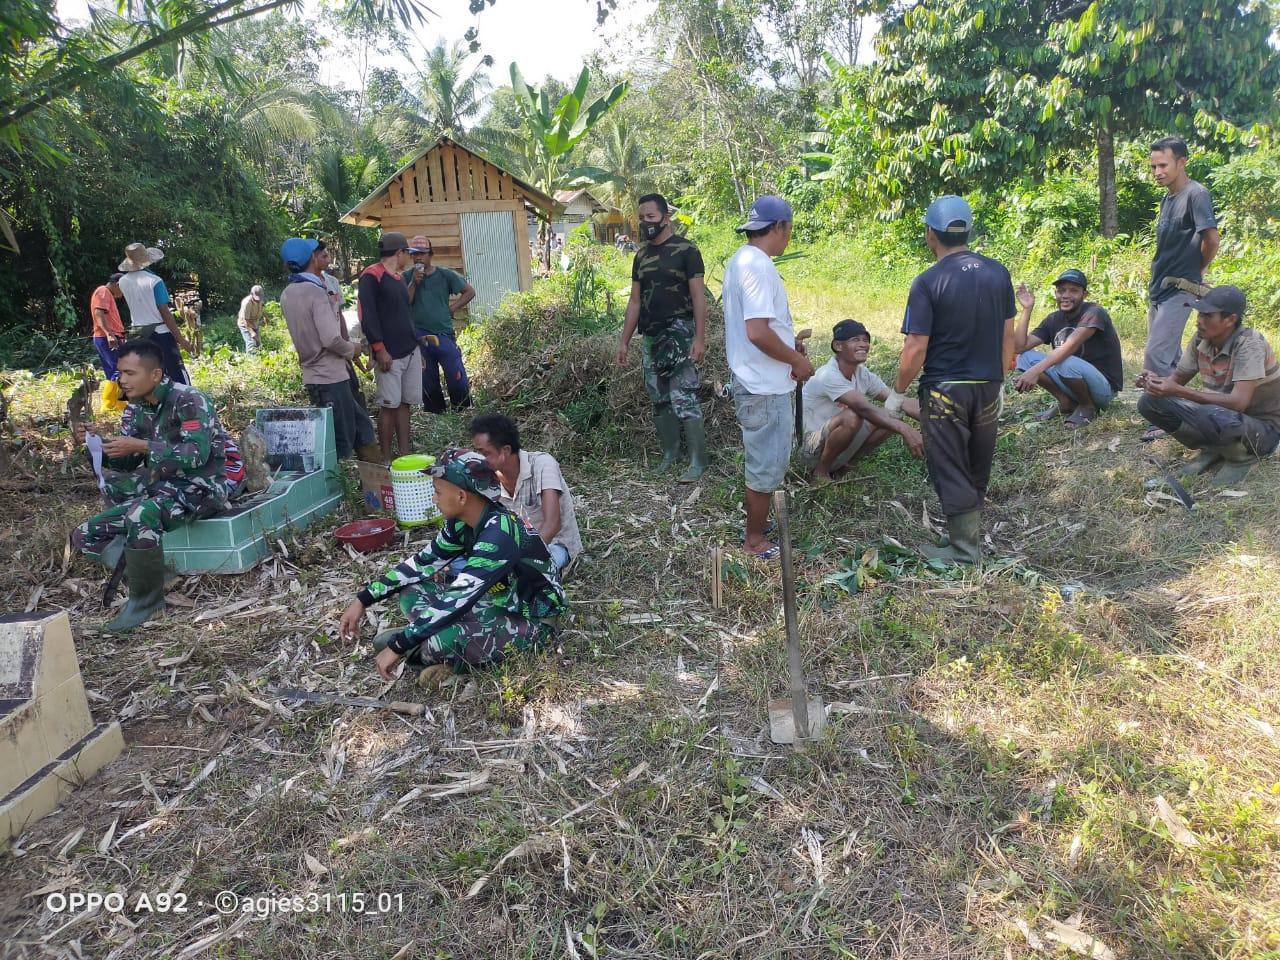 Satgas TMMD ke 110 Kodim 1008/TJG Bersama Warga Gotong Royong Bersihkan TPU